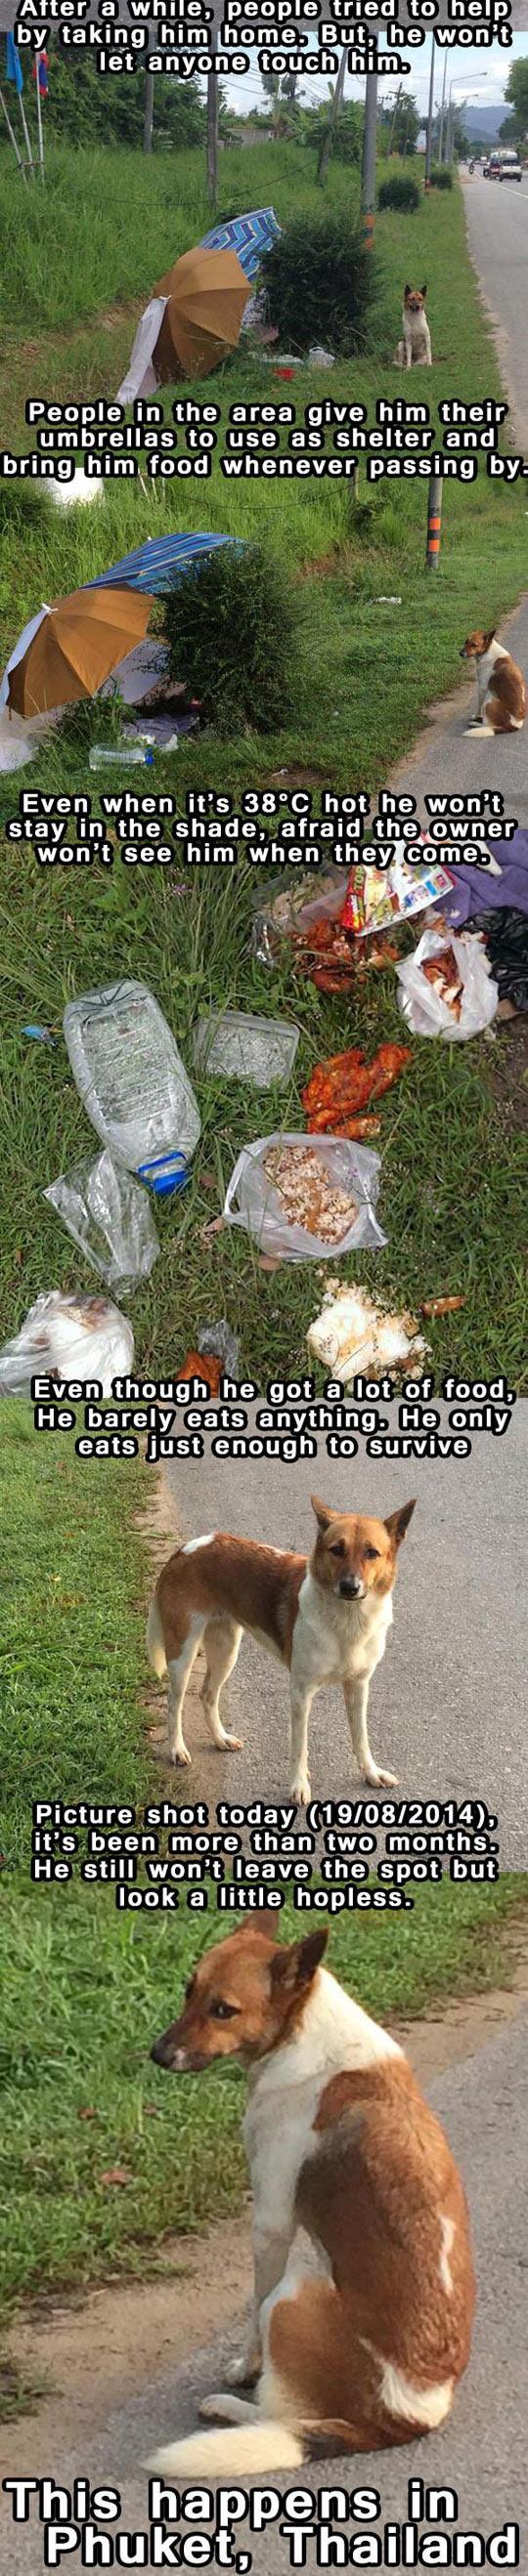 funny-dog-dumped-aside-road-umbrella-shelter-waiting